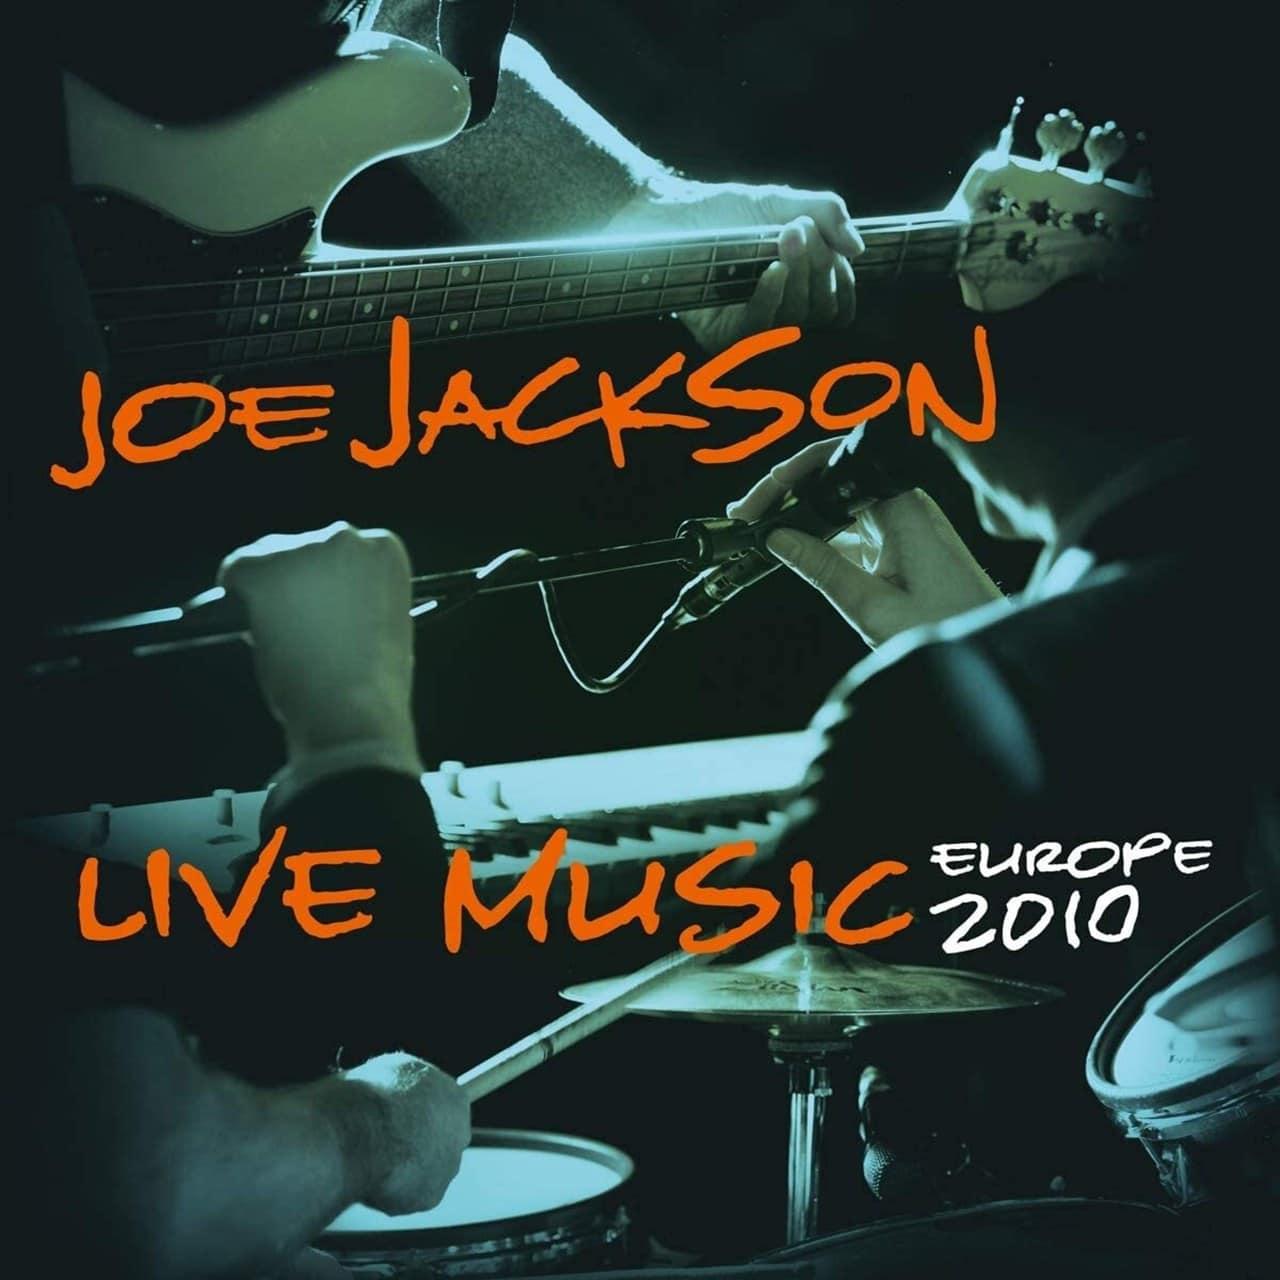 JOE JACKSON - LIVE MUSIC EUROPE 2010